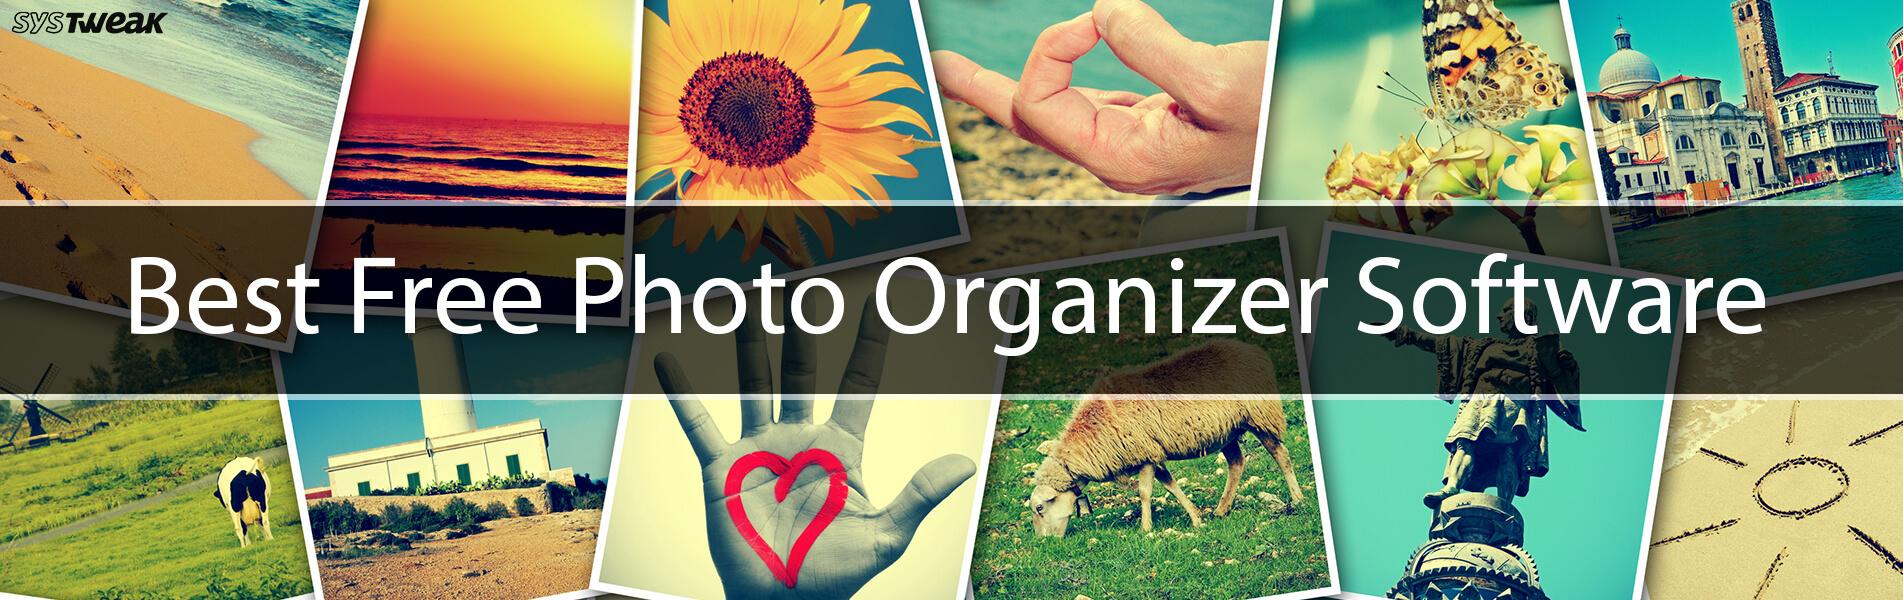 Best Free Photo Organizer Software For Windows 10, 8, 7 in 2018